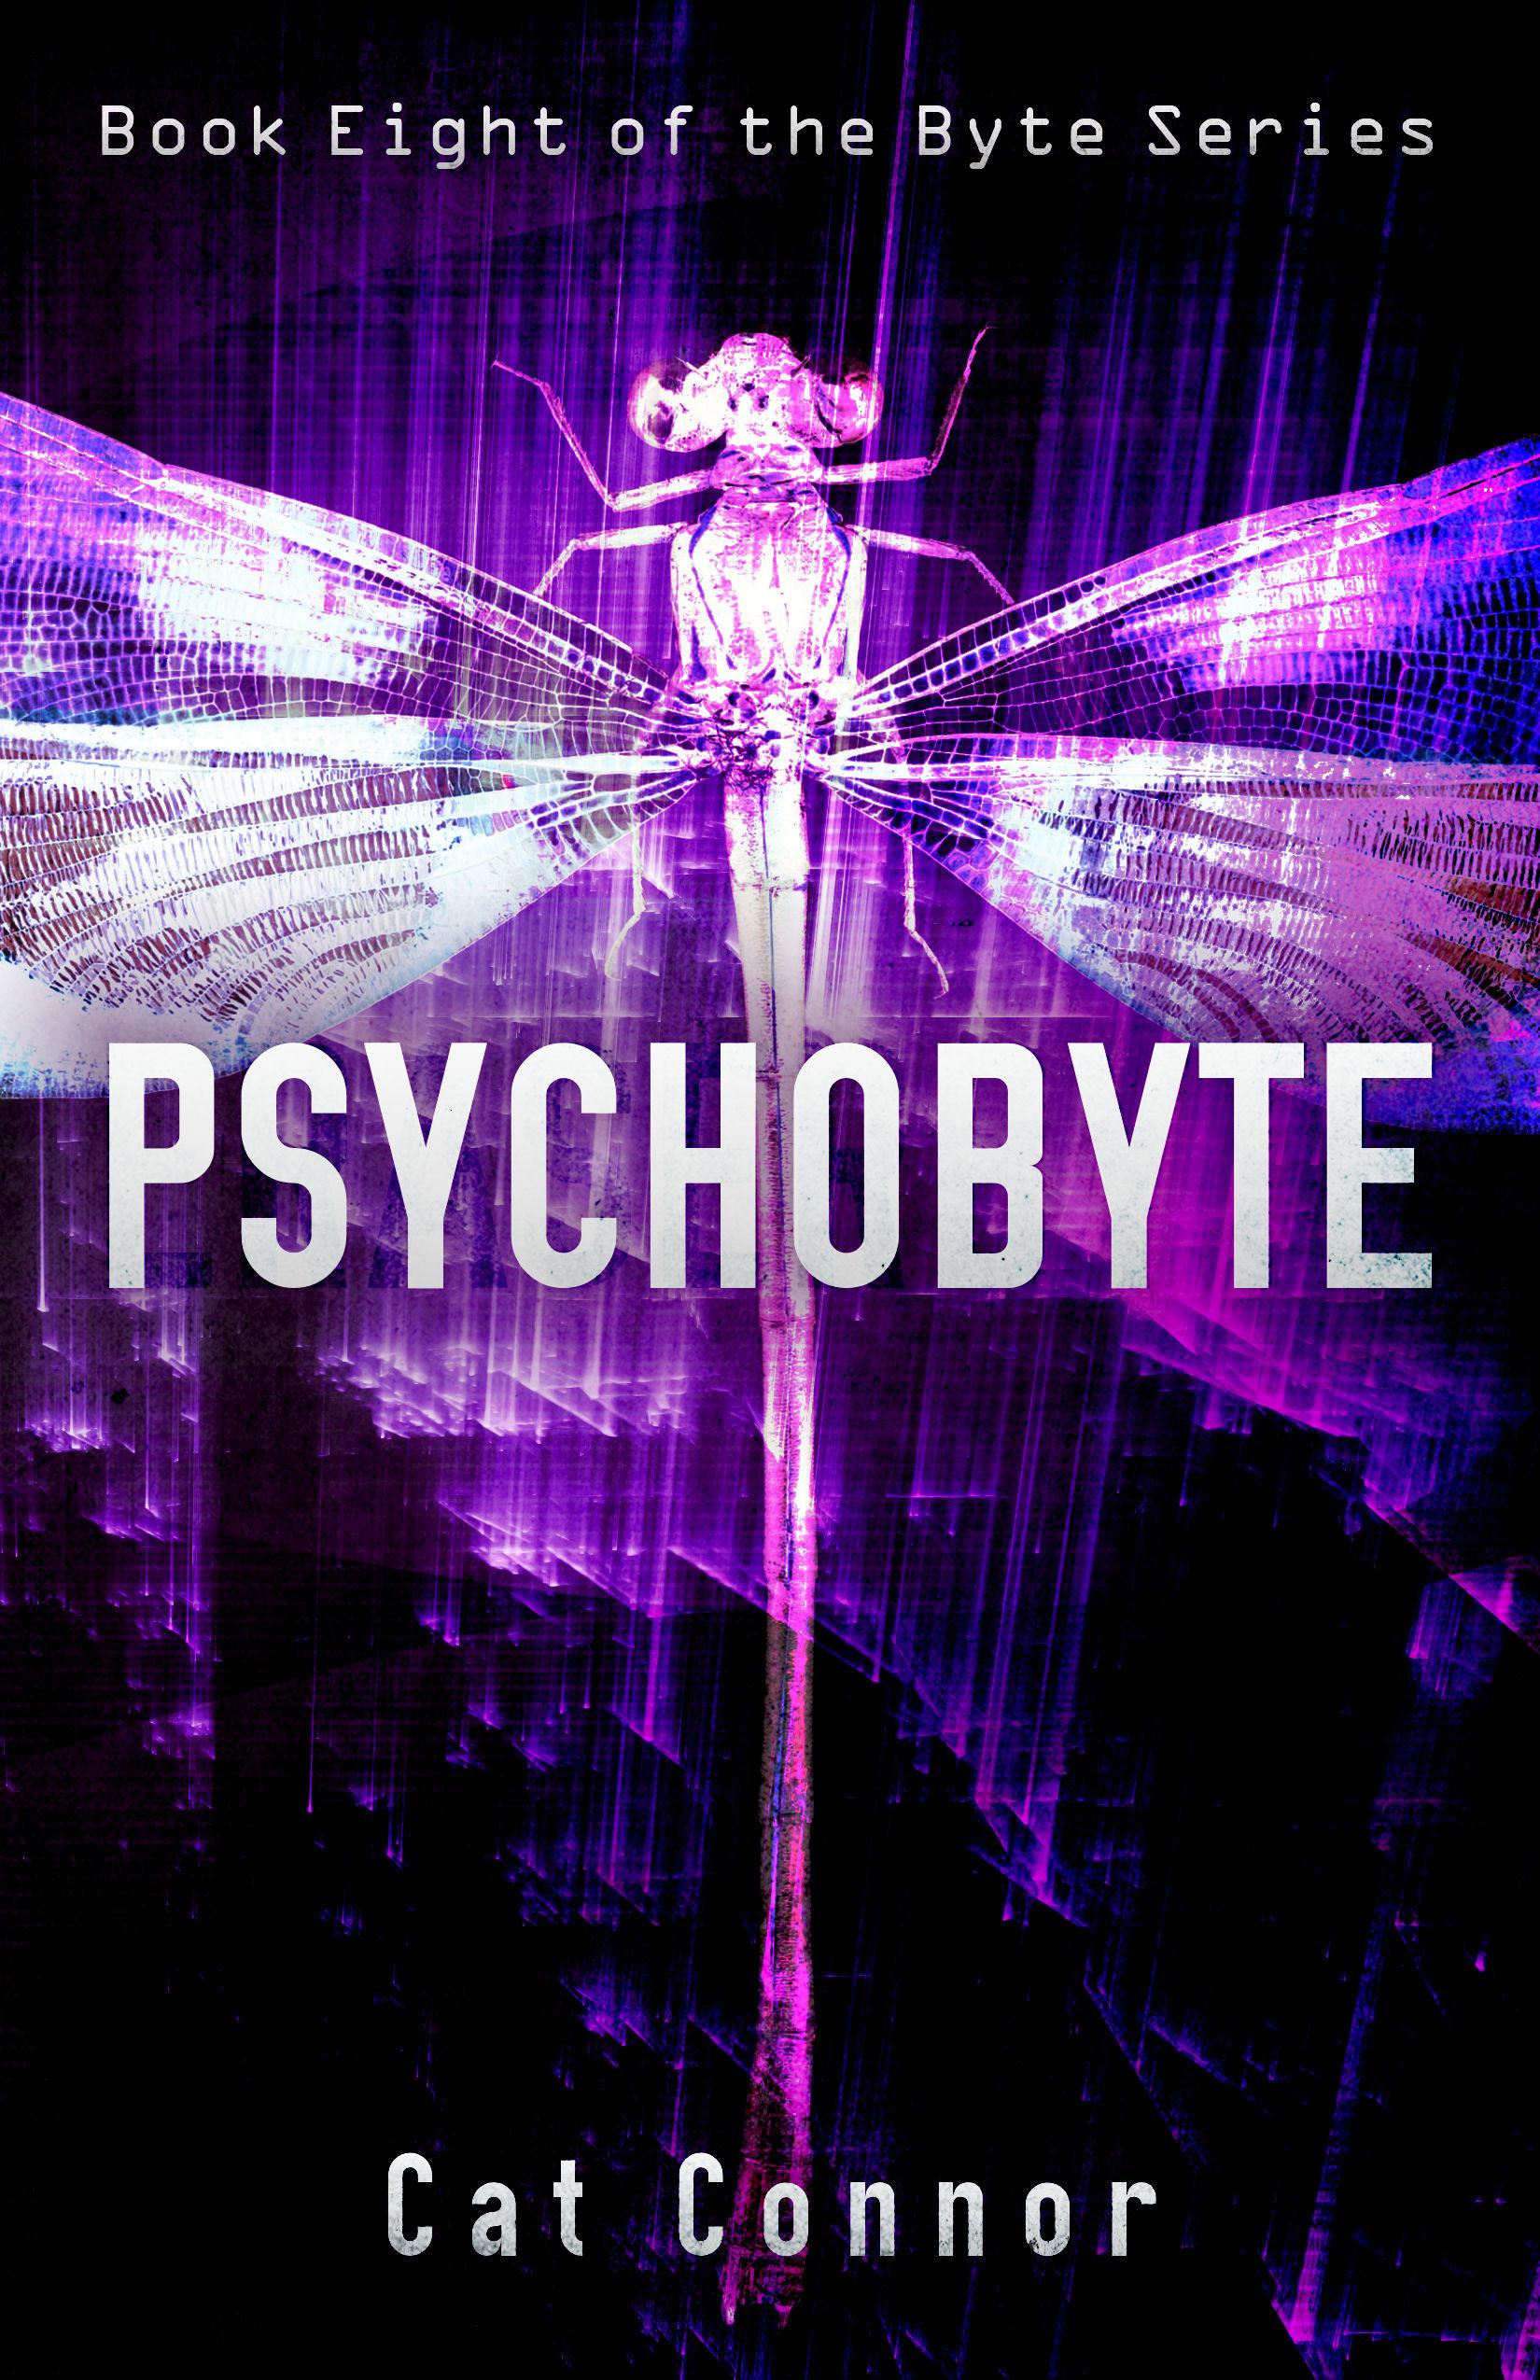 Psychobyte, an Ebook by Cat Connor